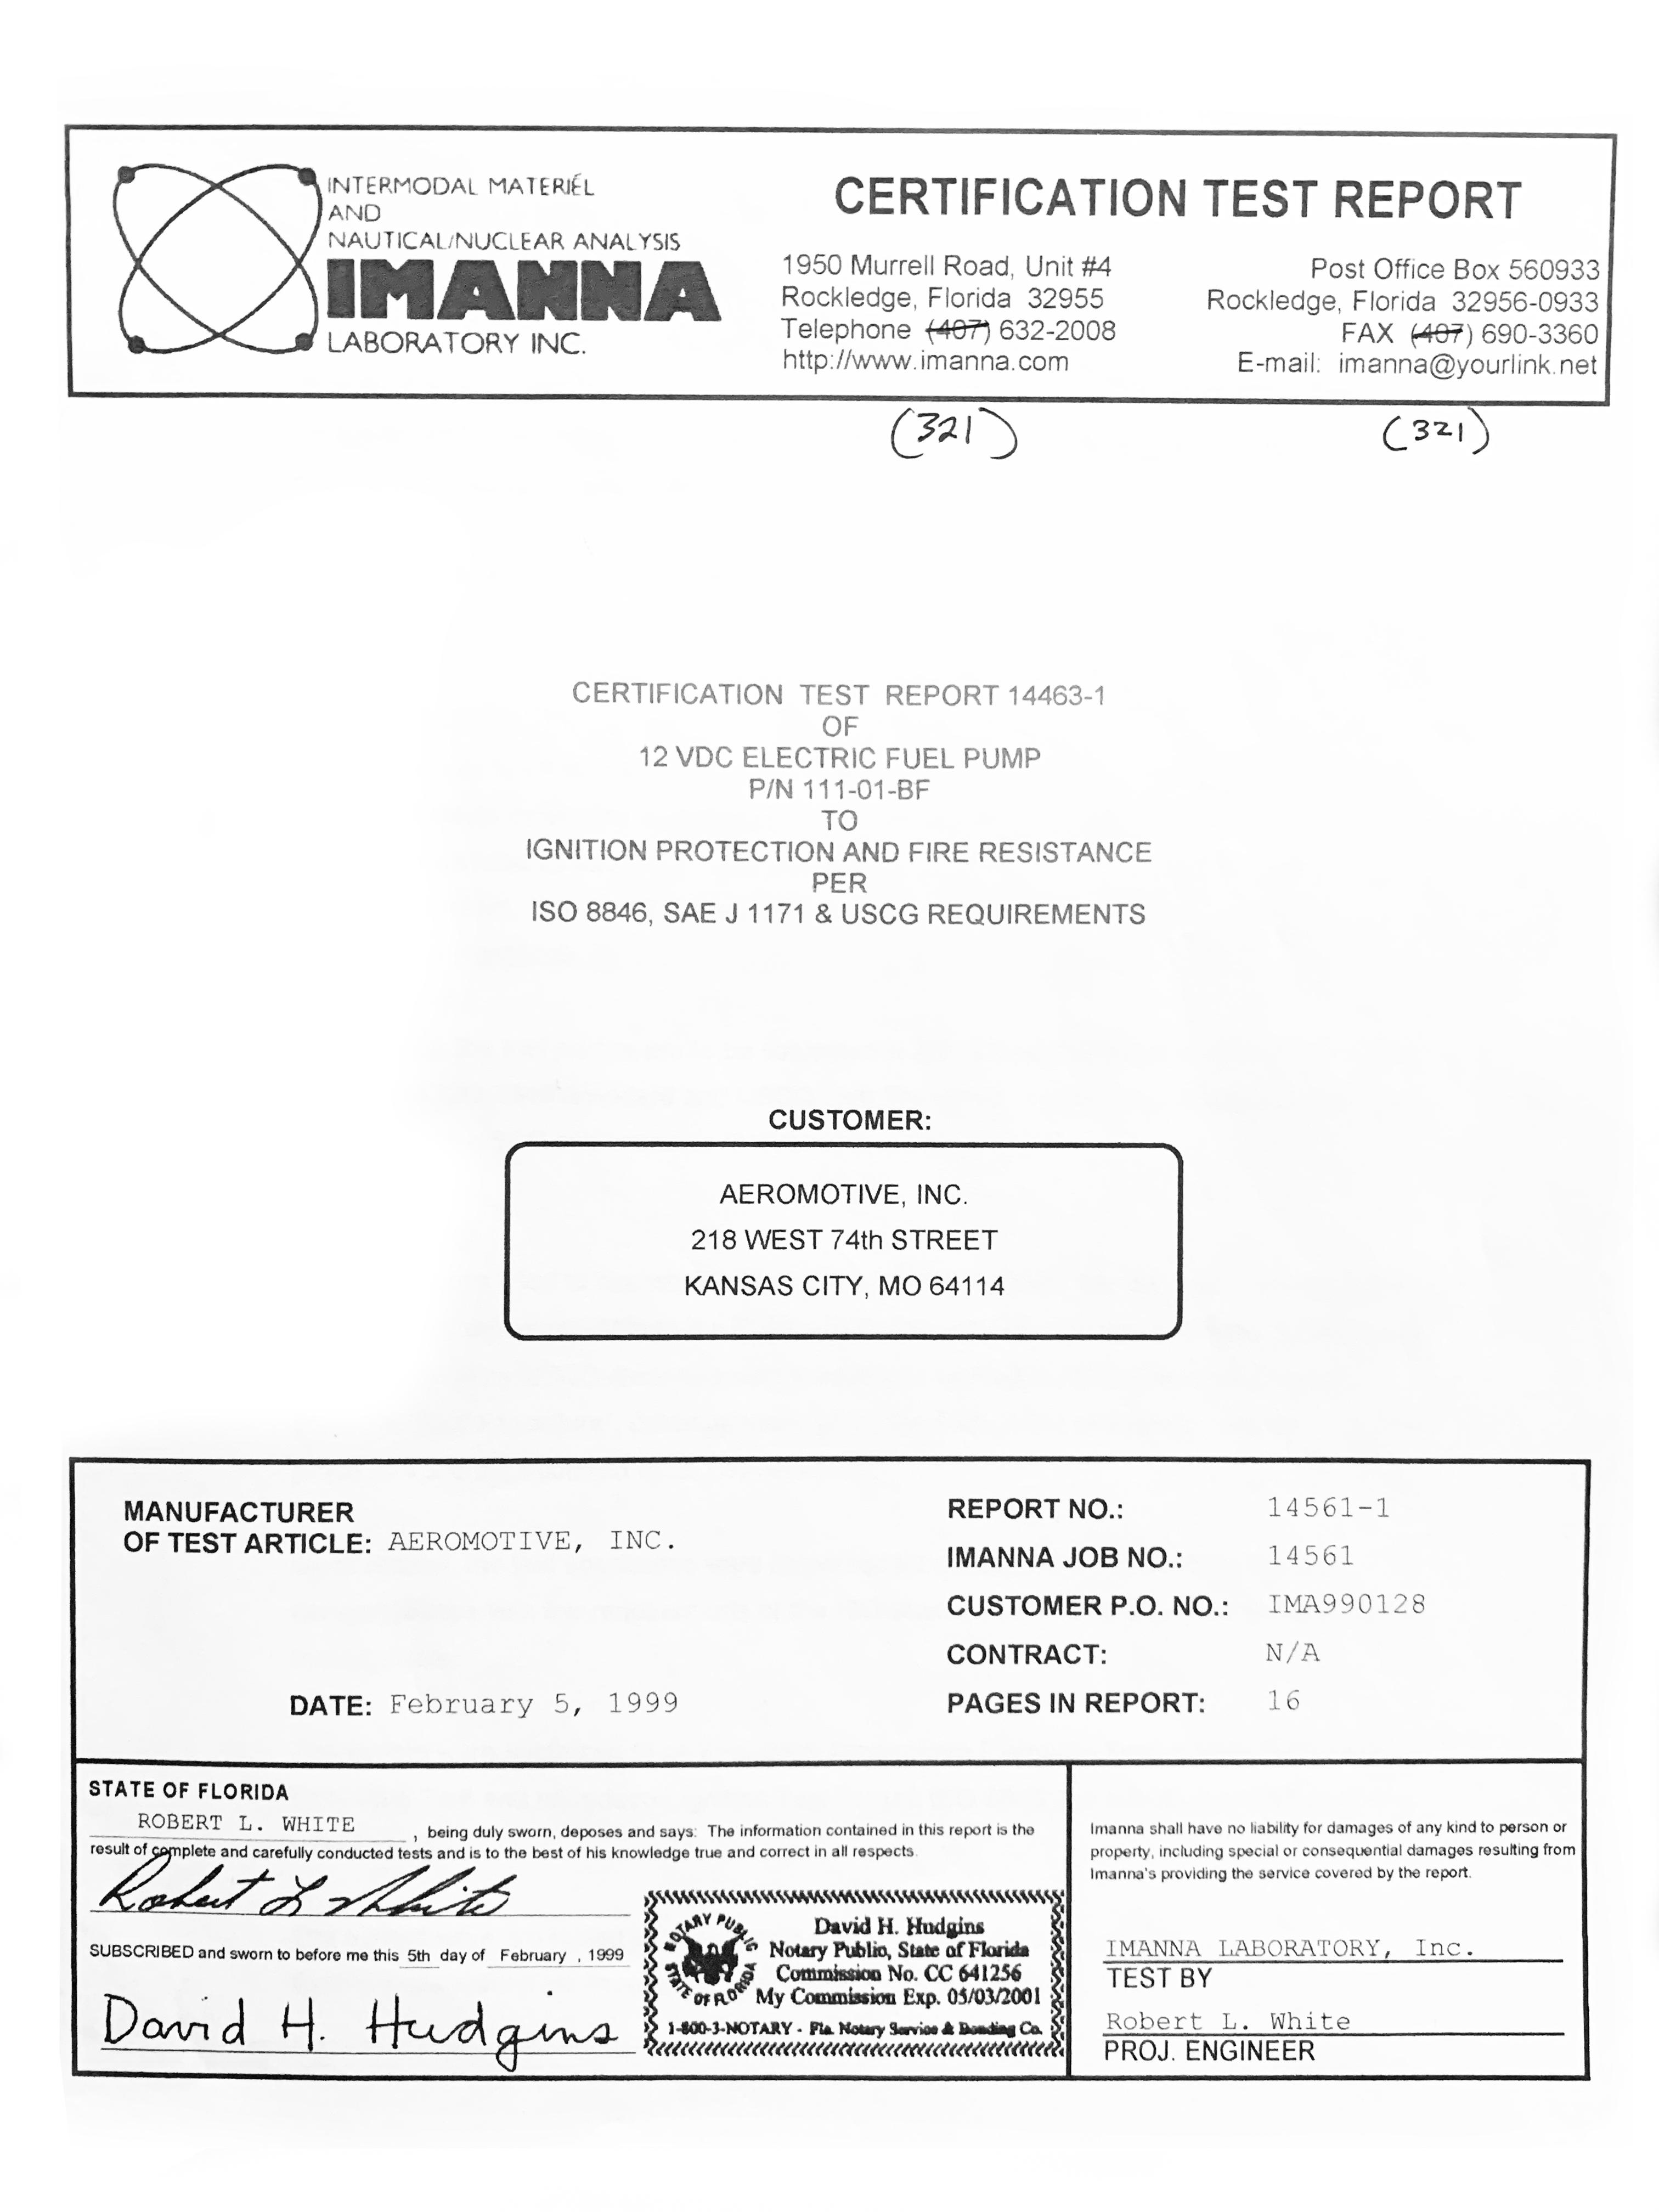 General Information – Aeromotive, Inc